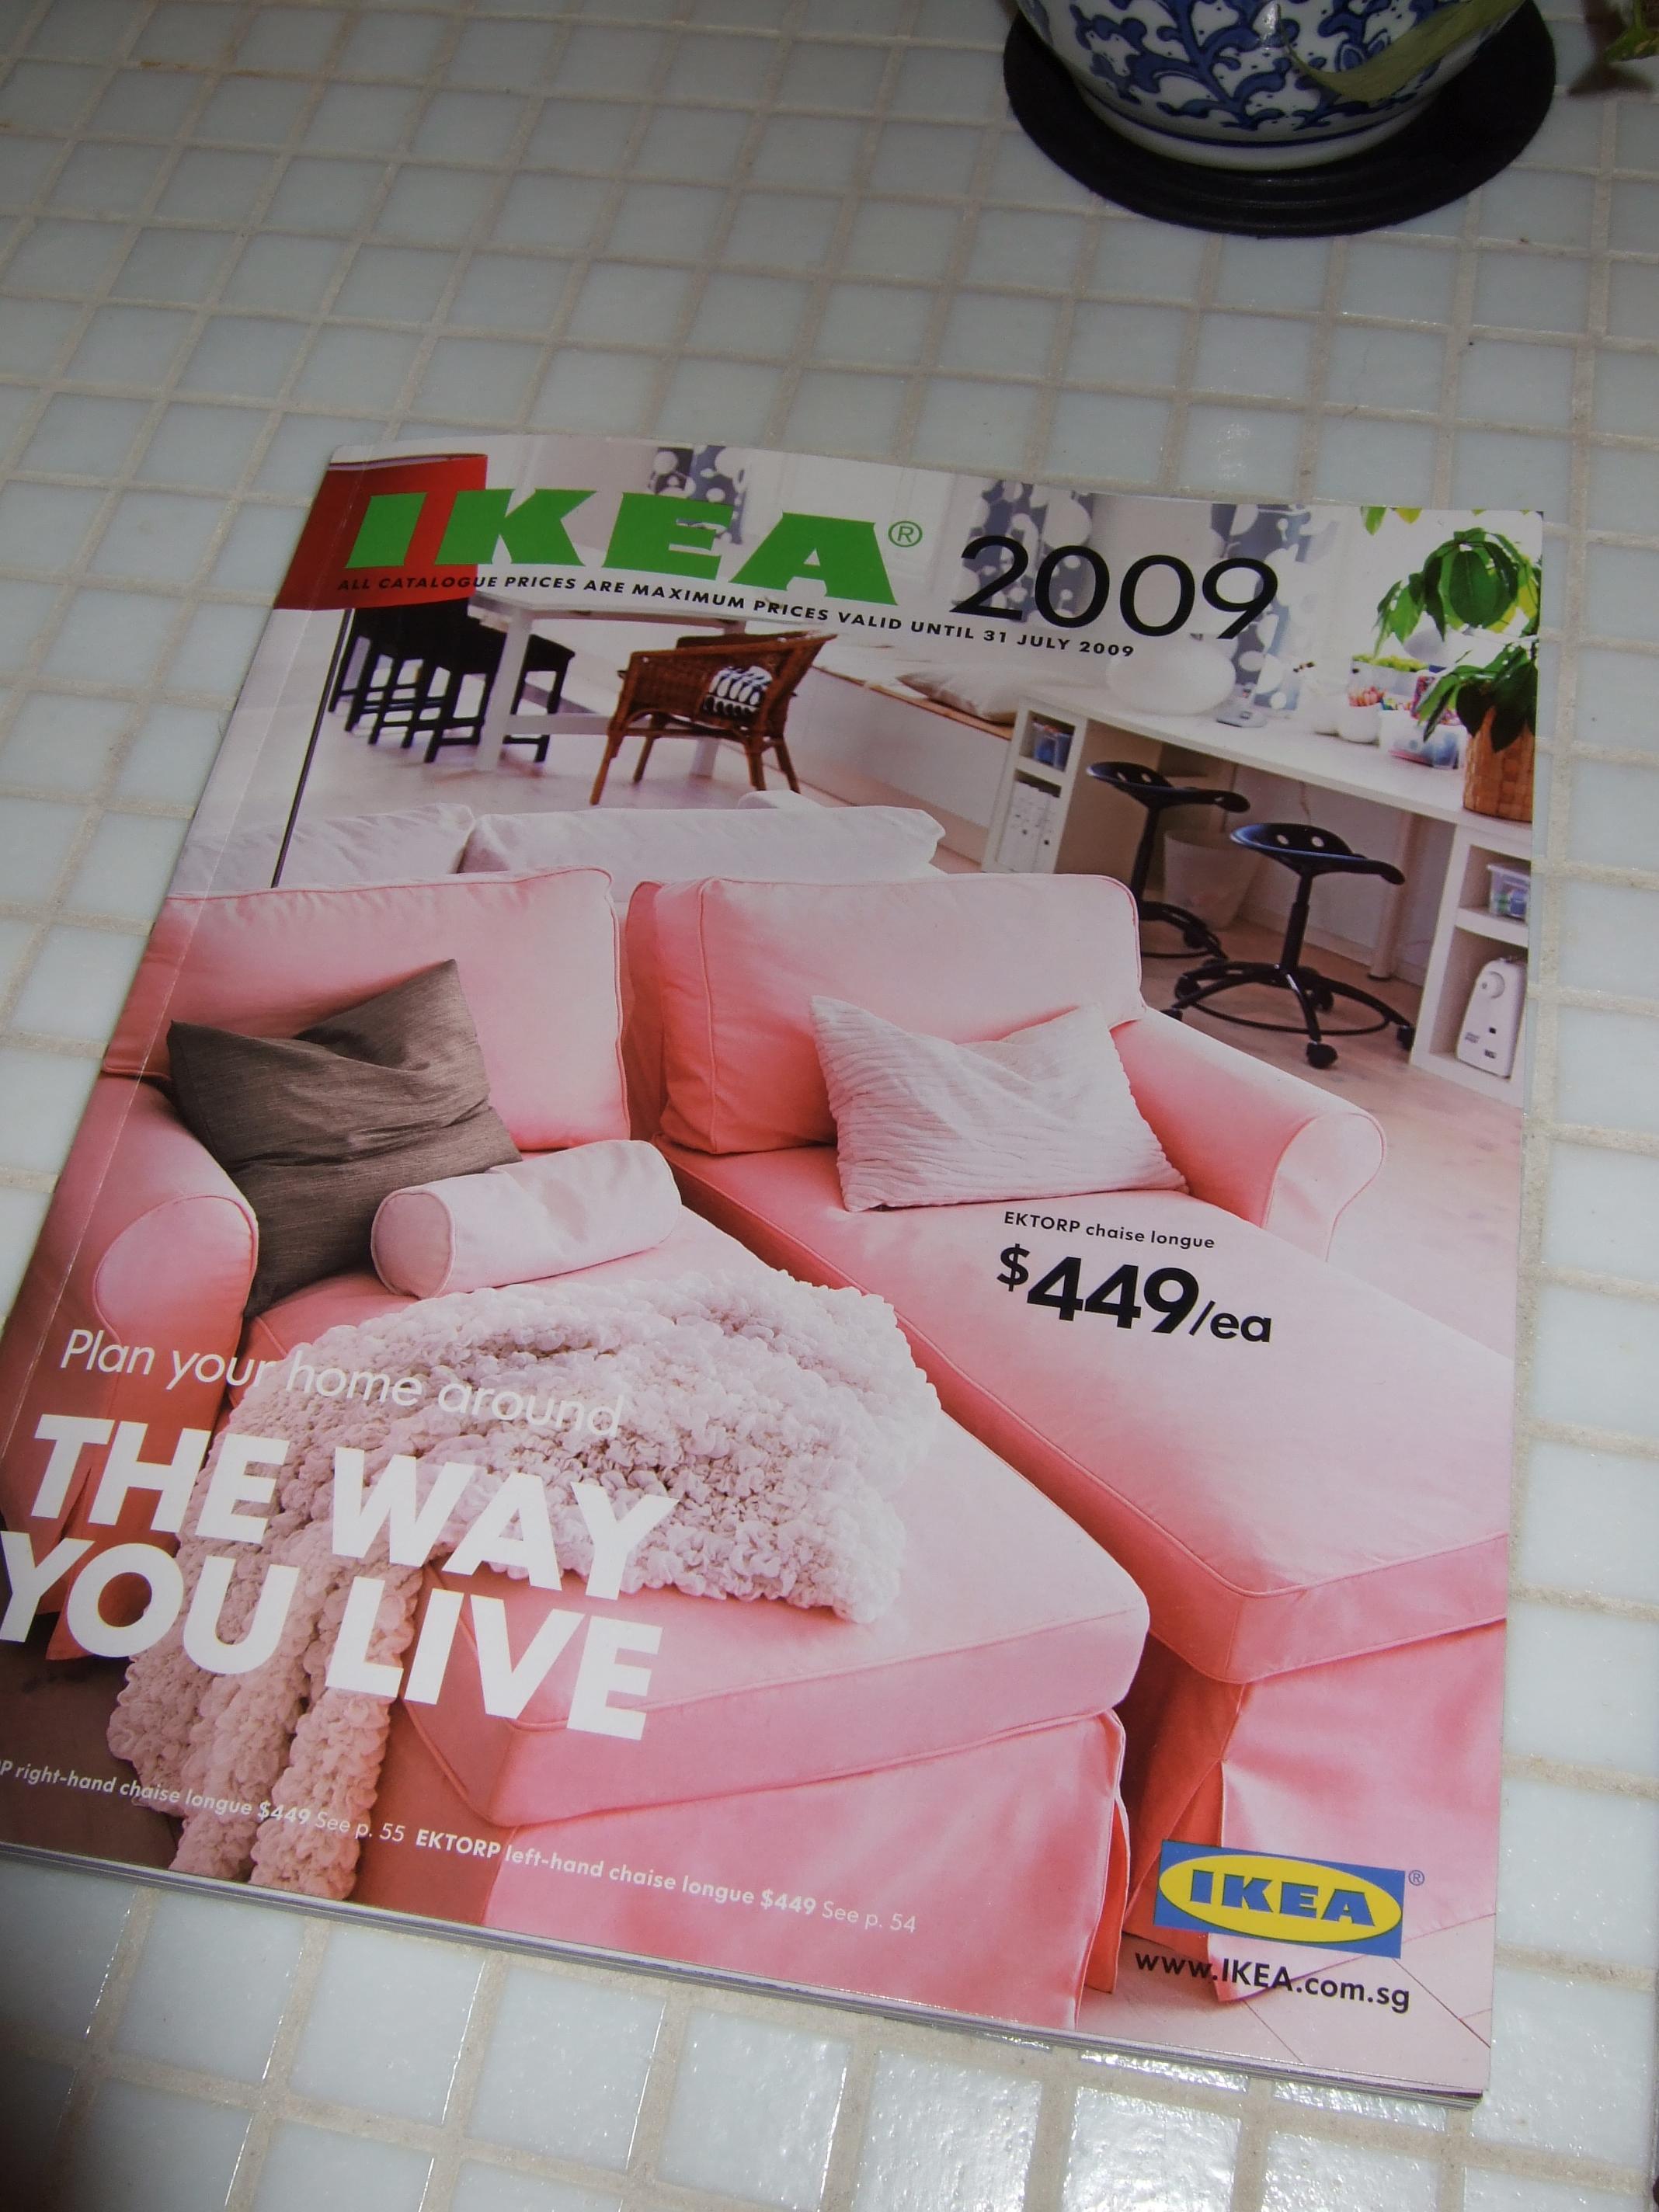 2009 Ikea Catalog ikea 2009 catalog - home design